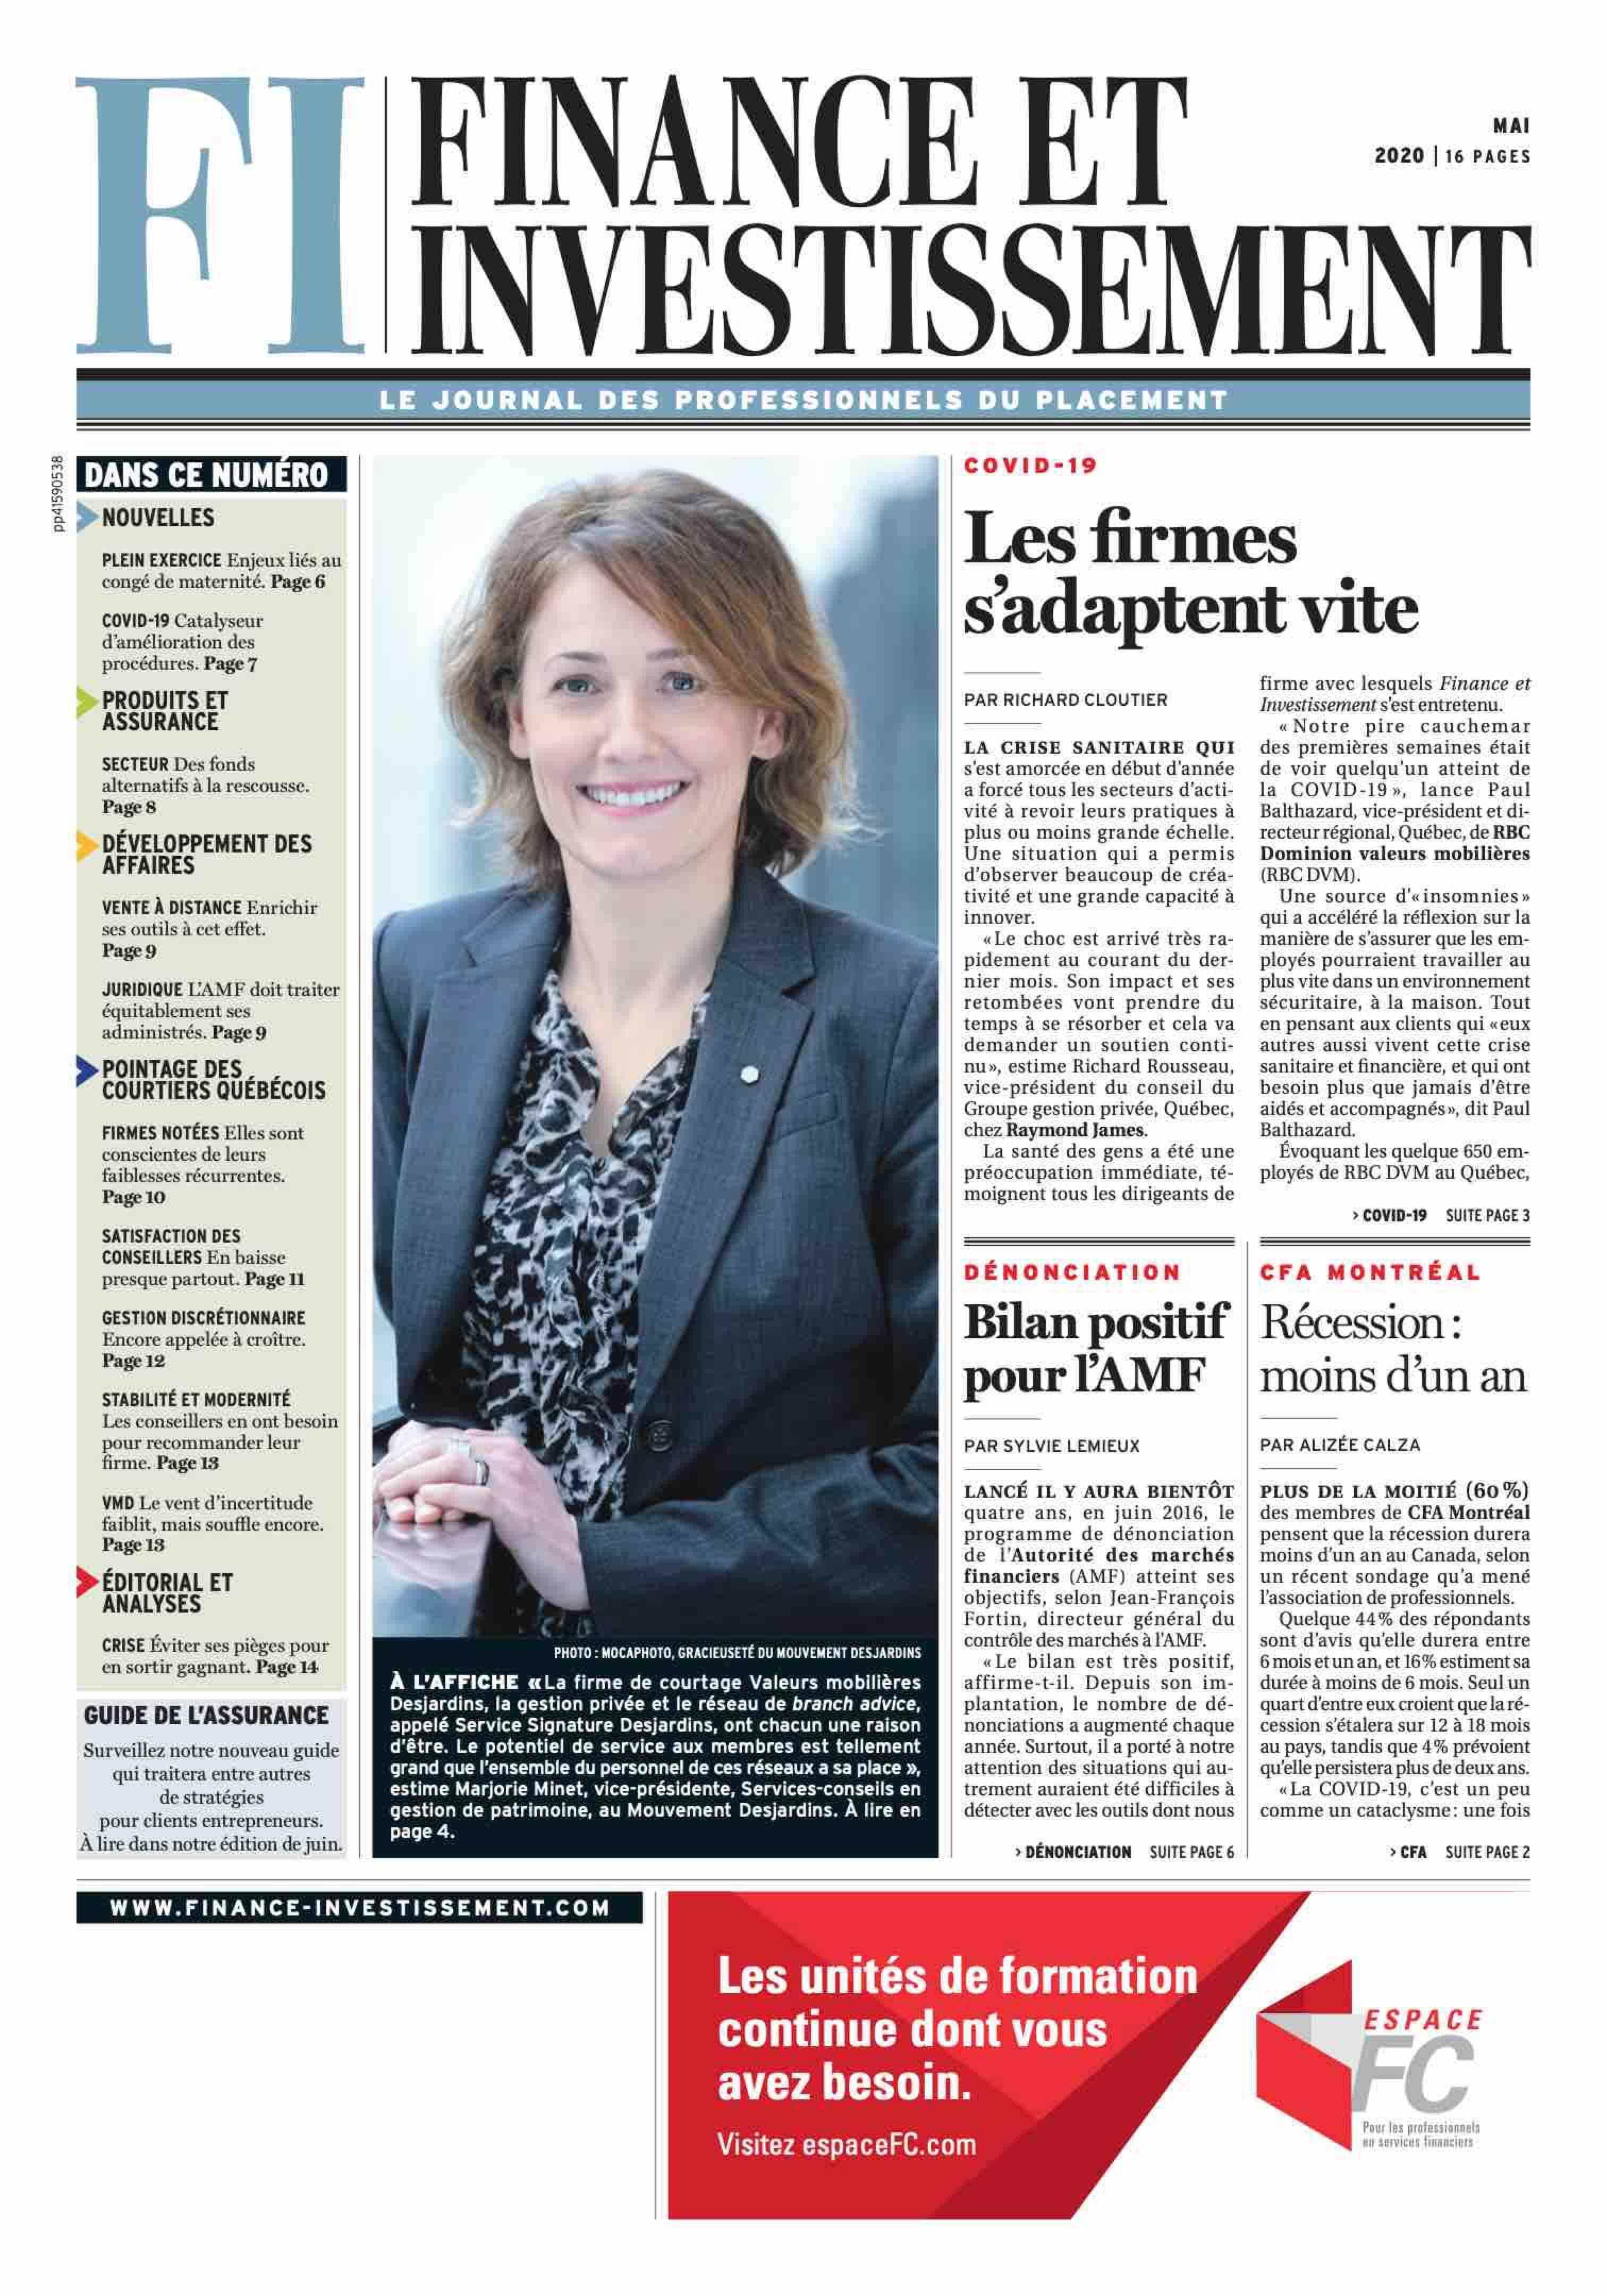 Finance et Investissement – 1 mai 2020